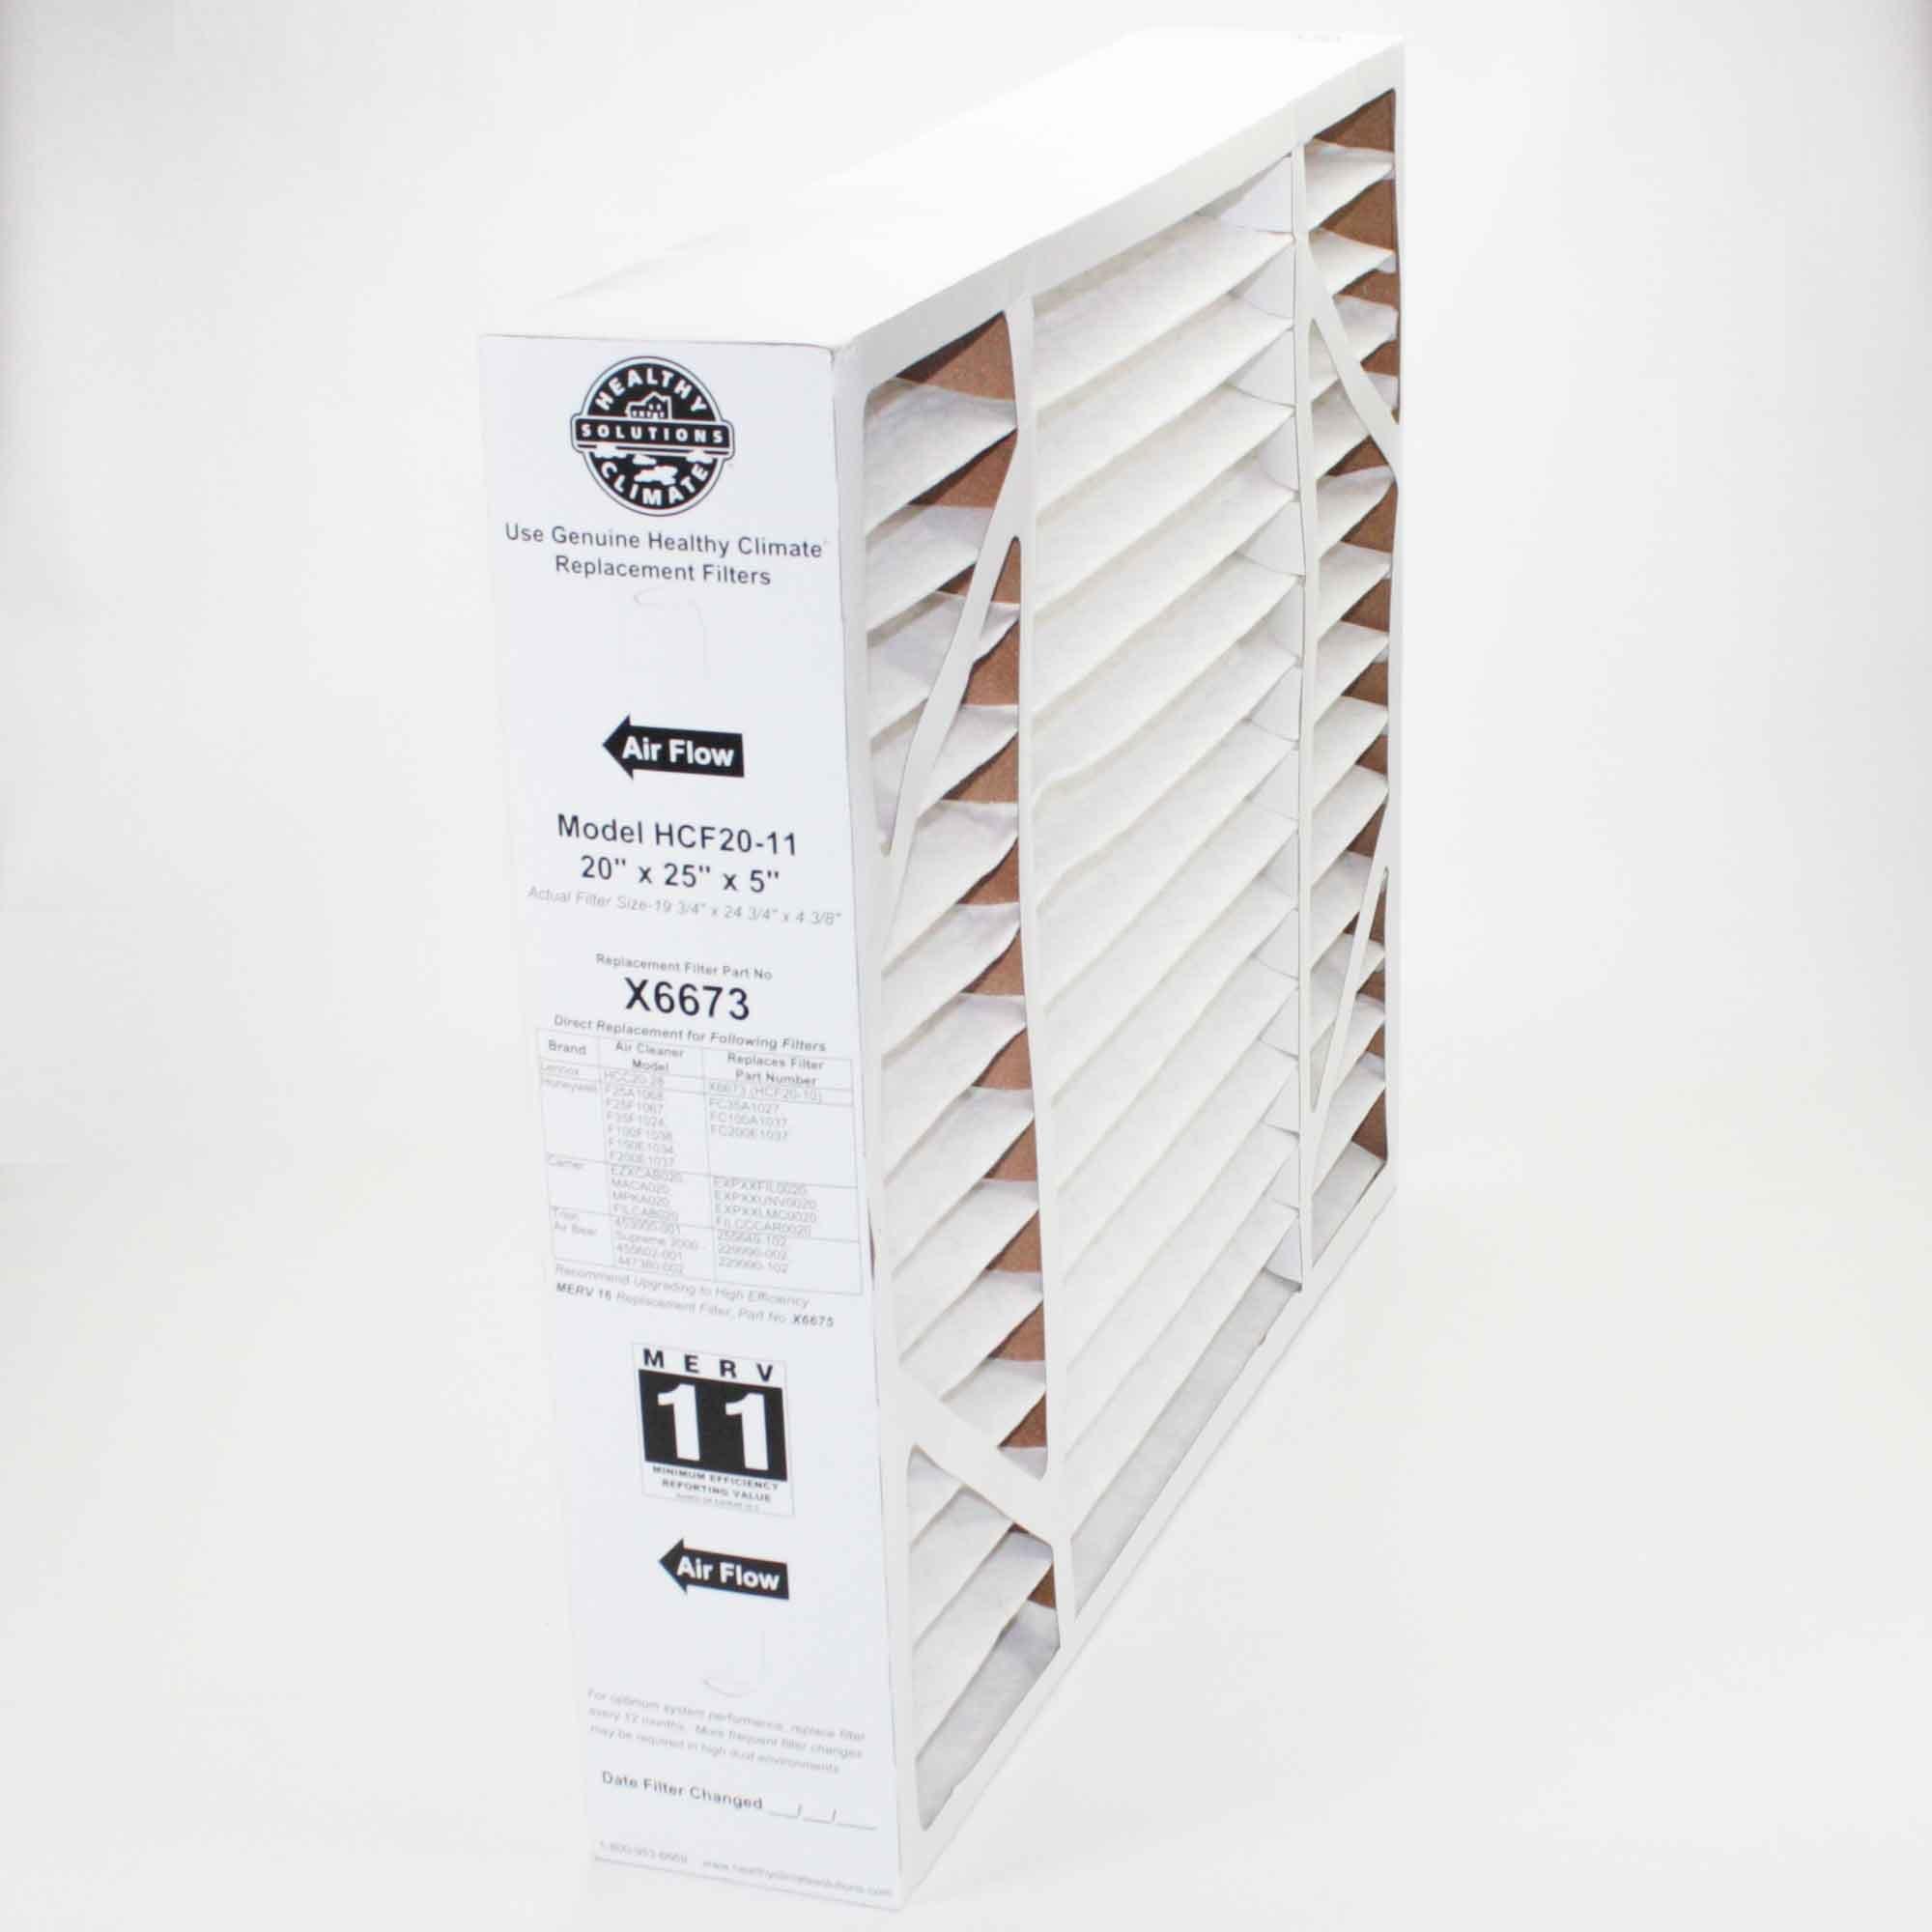 Lennox Healthy Climate 20x25x5 x6673 MERV 11 Box Filter